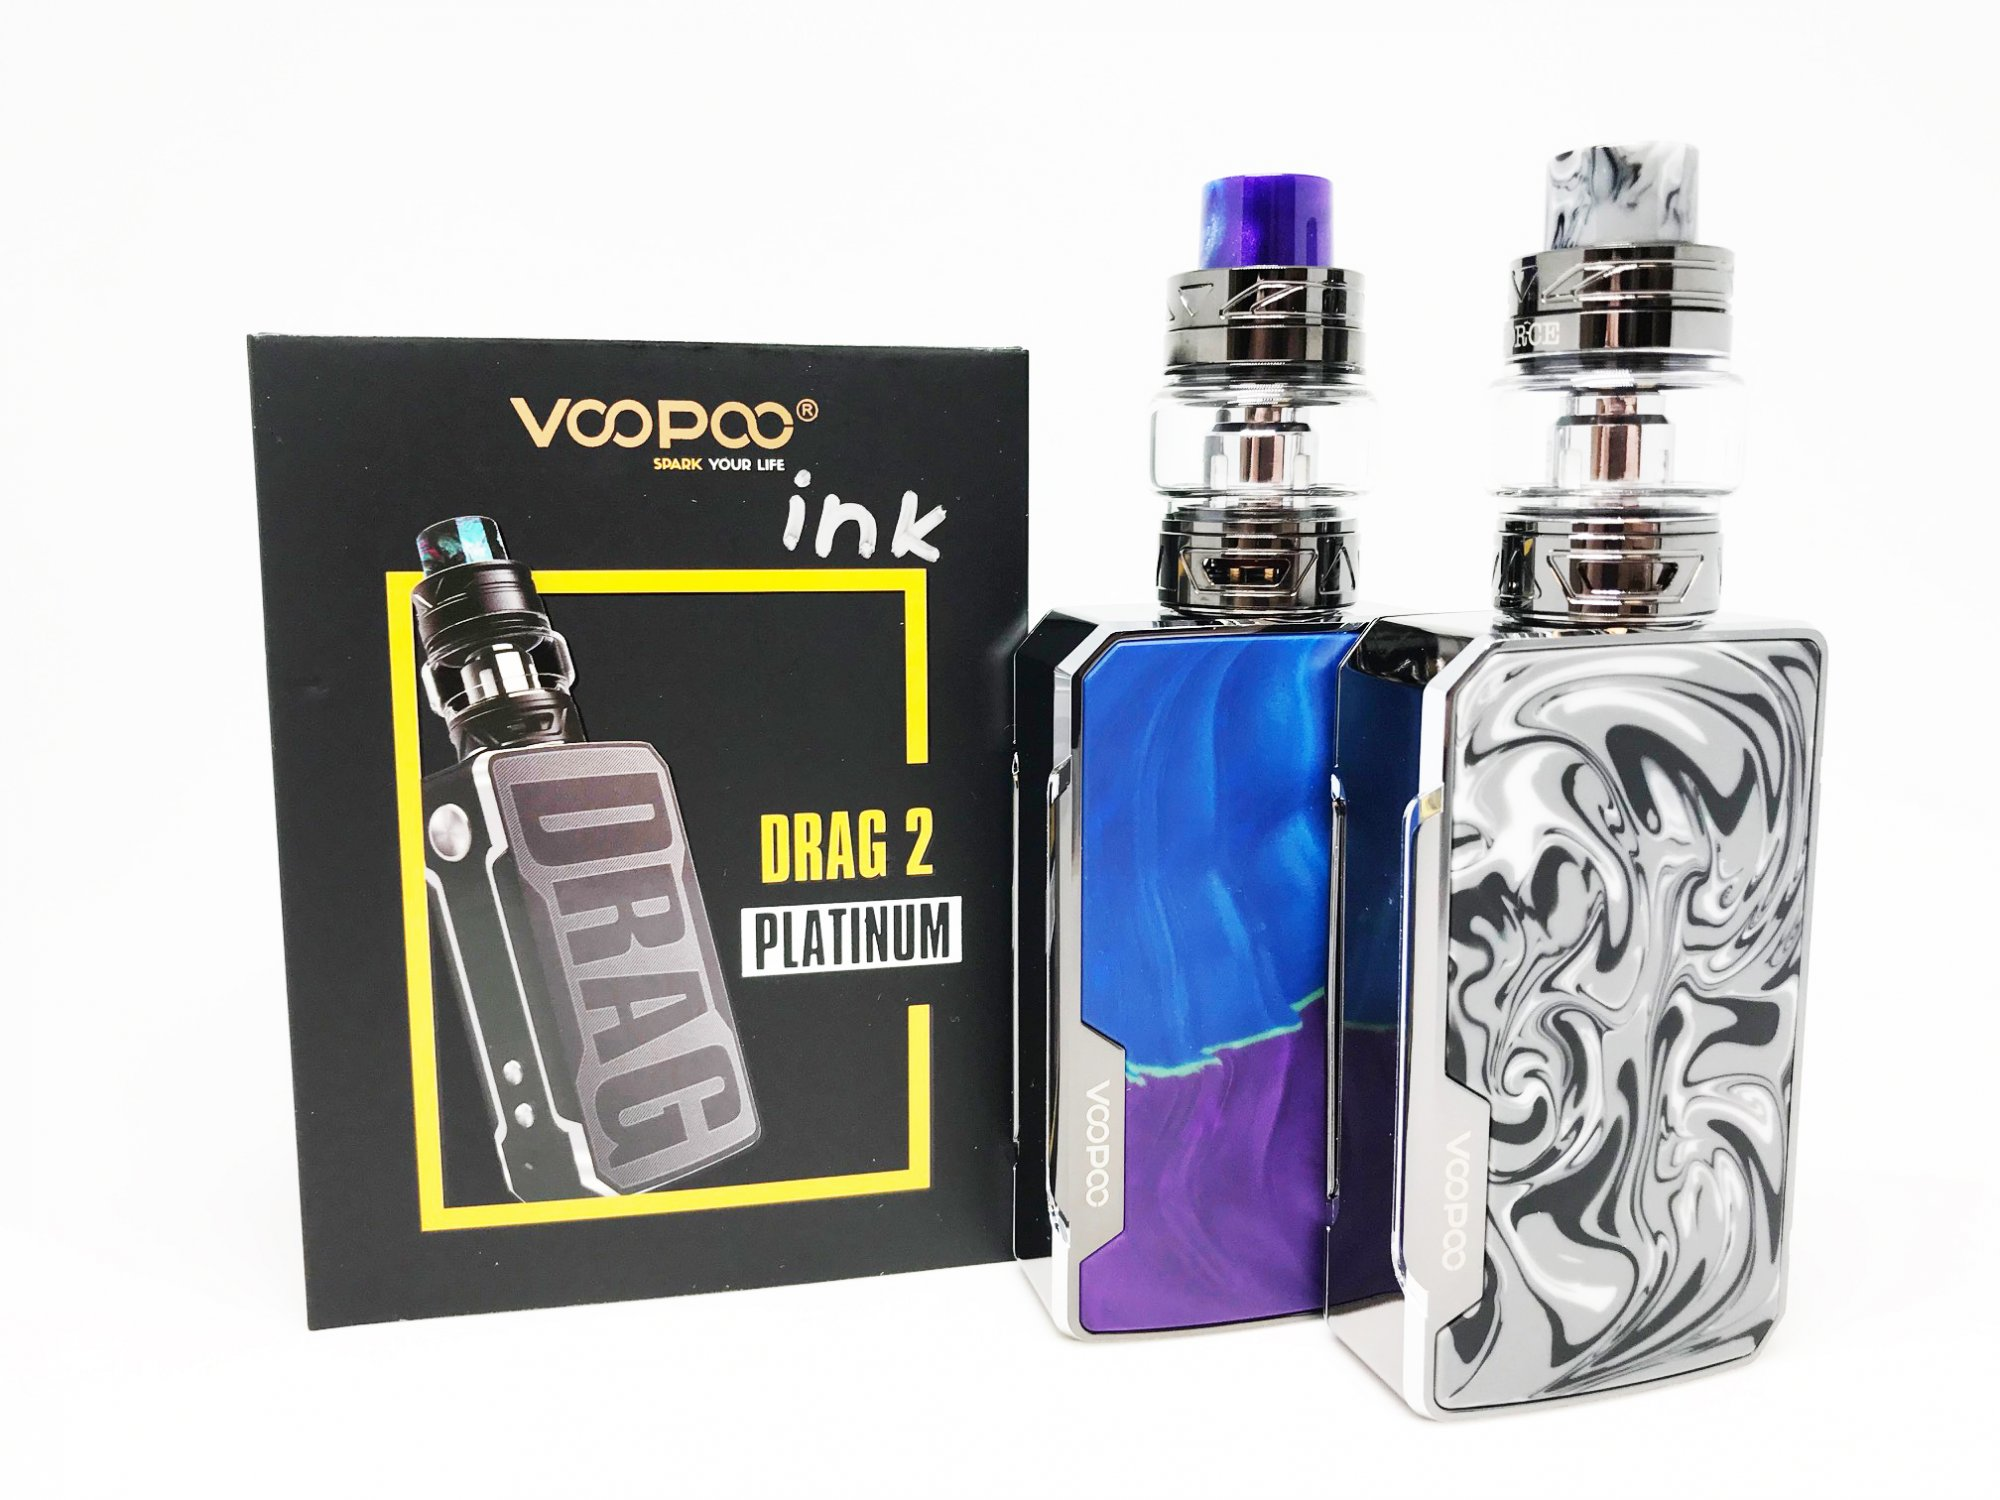 VooPoo Drag 2 Platinum Edition Kit